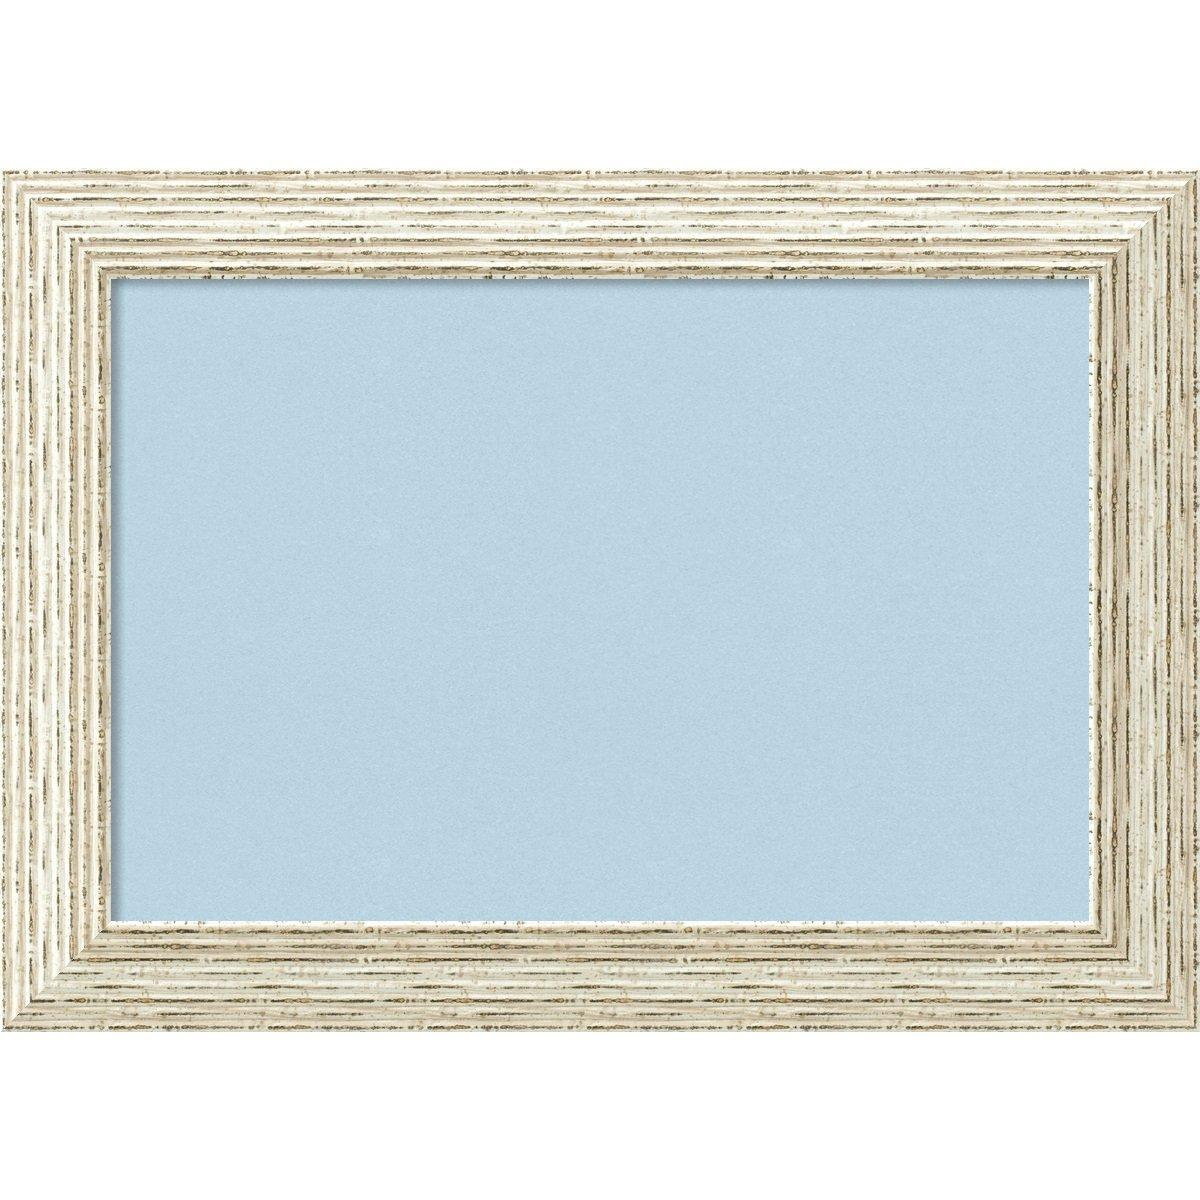 Amanti Art Blue Cork Cape Cod White Wash Framed Bulletin Boards, Small,